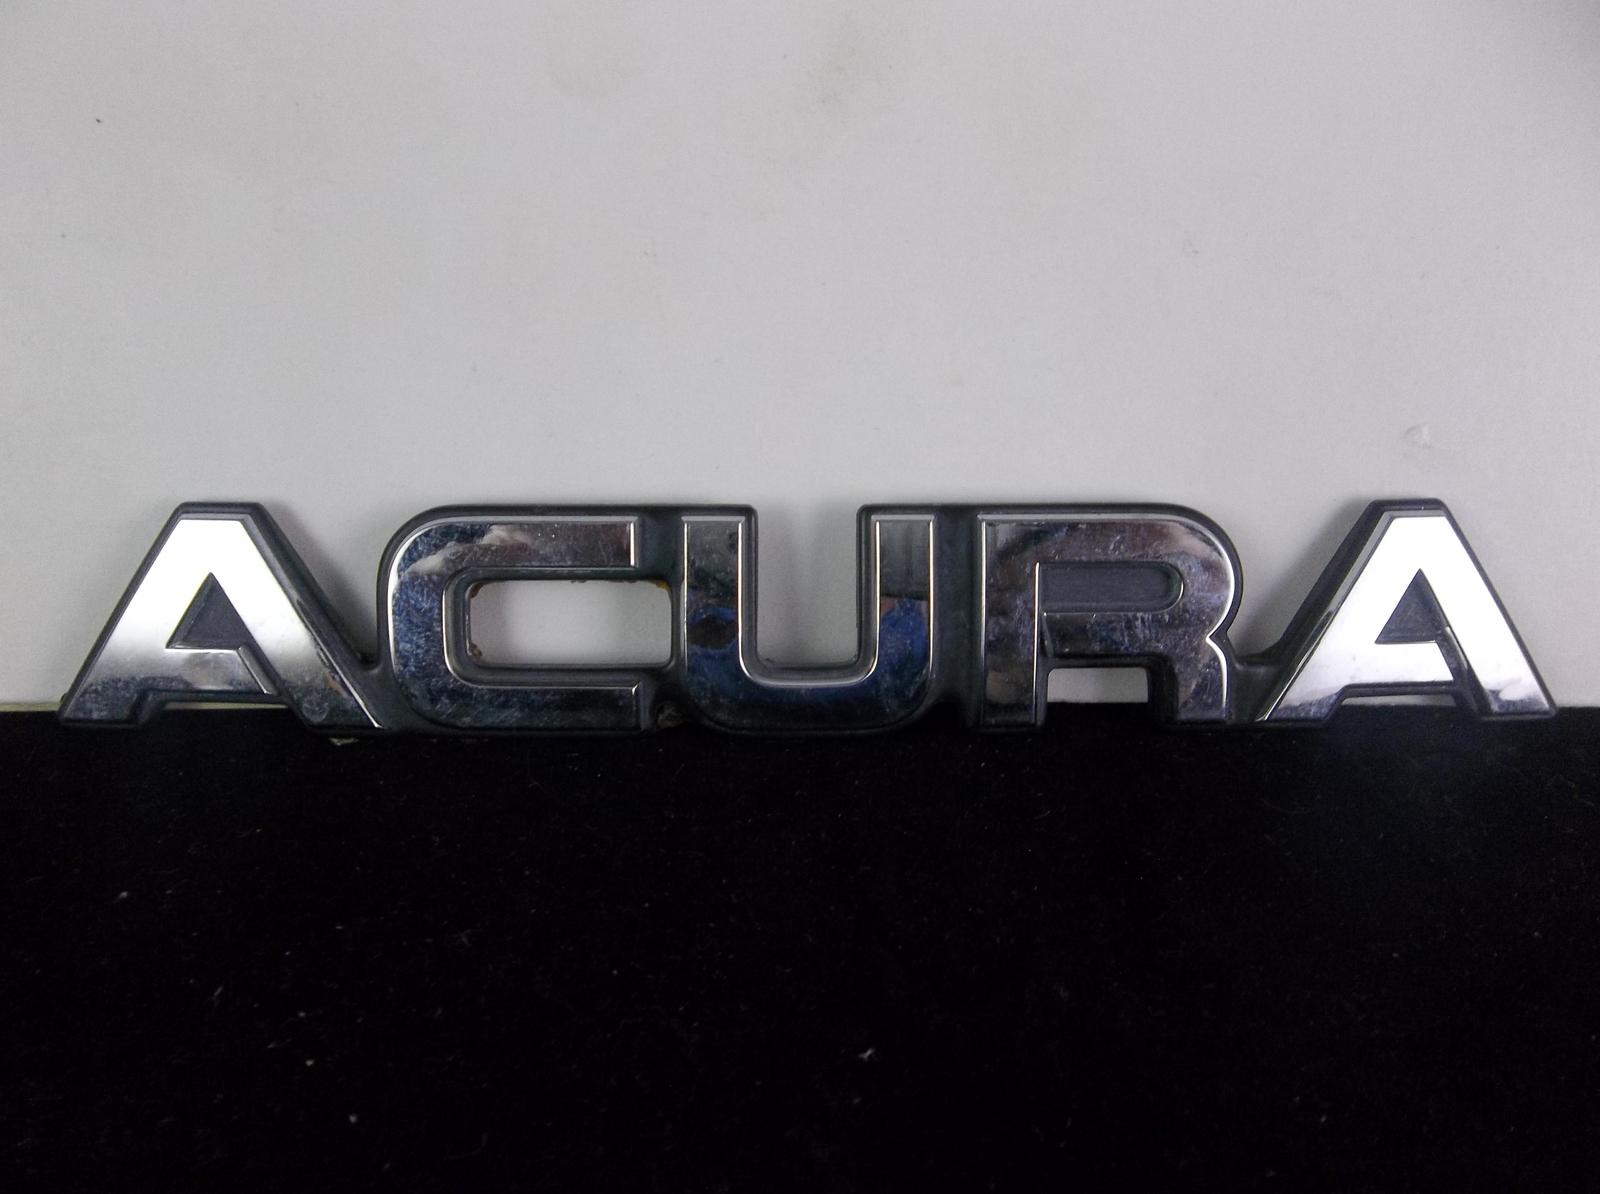 2x OEM F-350 XLT Super Duty  Emblems Badge S for Ford F350 XLT Black Red